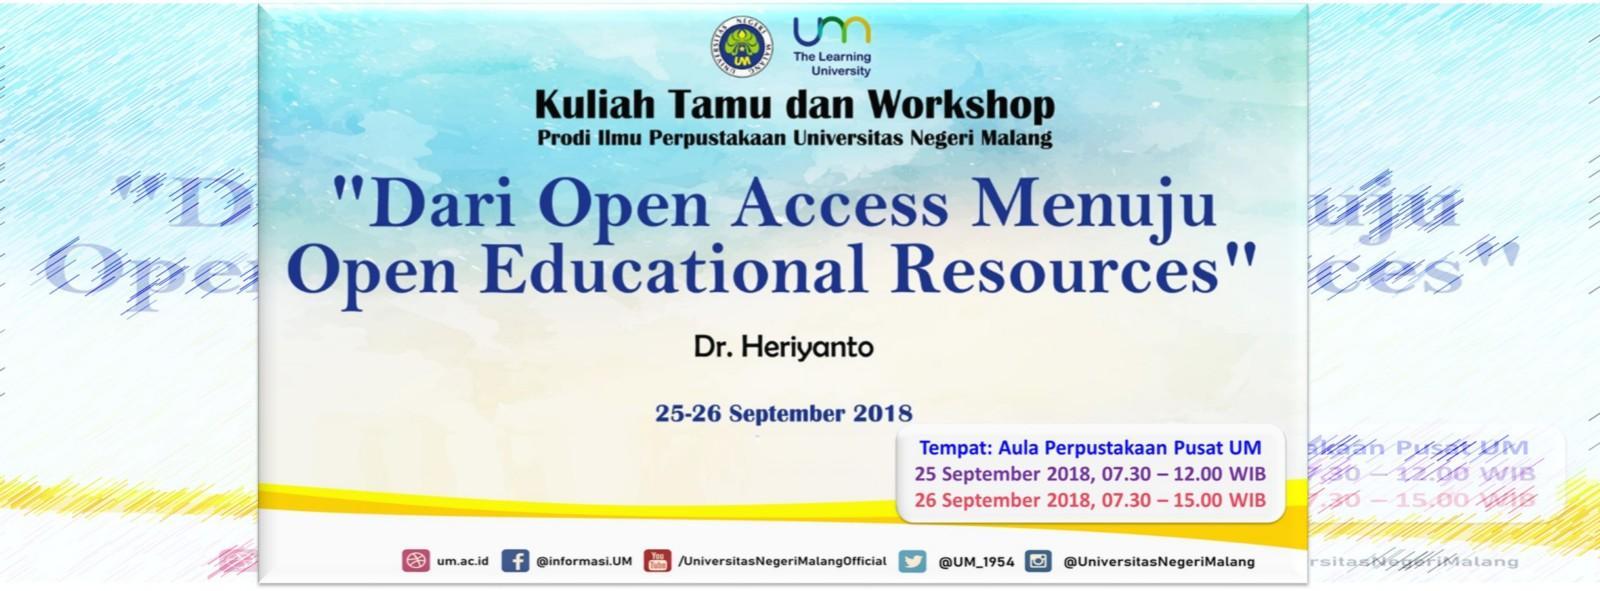 Kuliah Tamu dan Workshop Prodi Ilmu Perpustakaan Universitas Negeri Malang 2018